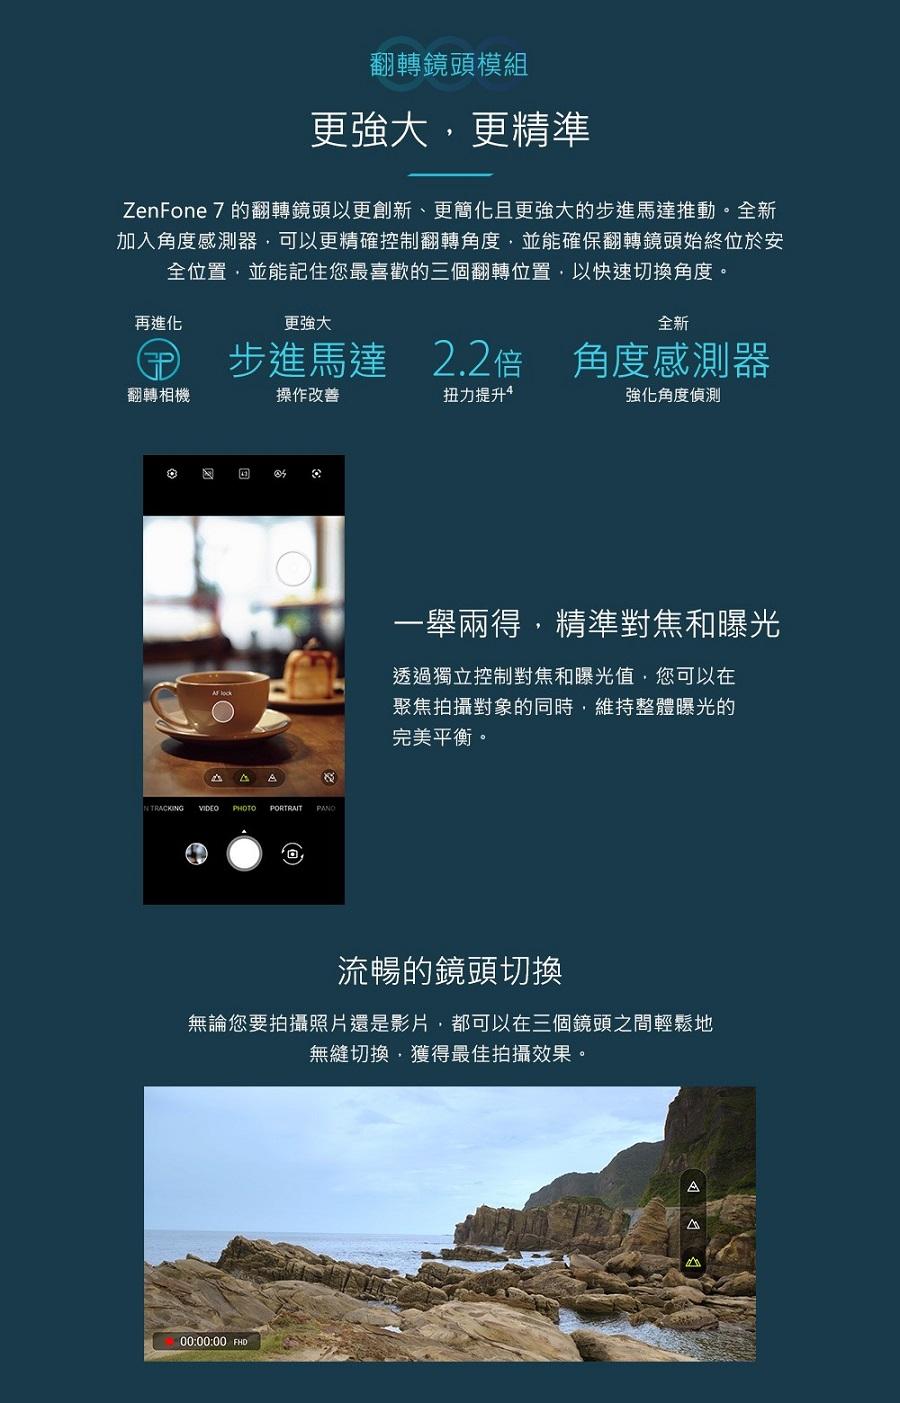 ZenFone 7 的翻轉鏡頭以更創新、更簡化且更強大的步進馬達推動。全新加入角度感測器,可以更精確控制翻轉角度,並能確保翻轉鏡頭始終位於安全位置,並能記住您最喜歡的三個翻轉位置,以快速切換角度。